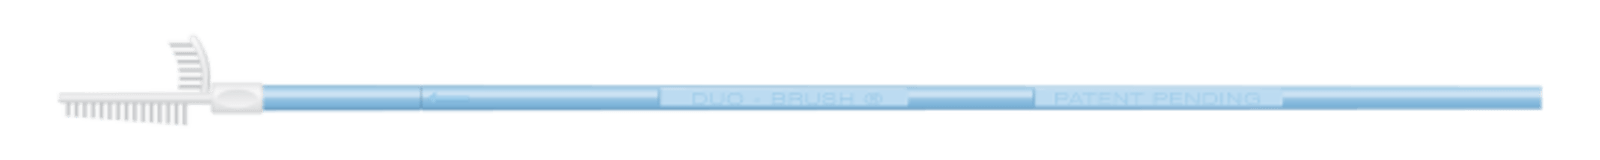 Duo-Brush® non sterile img